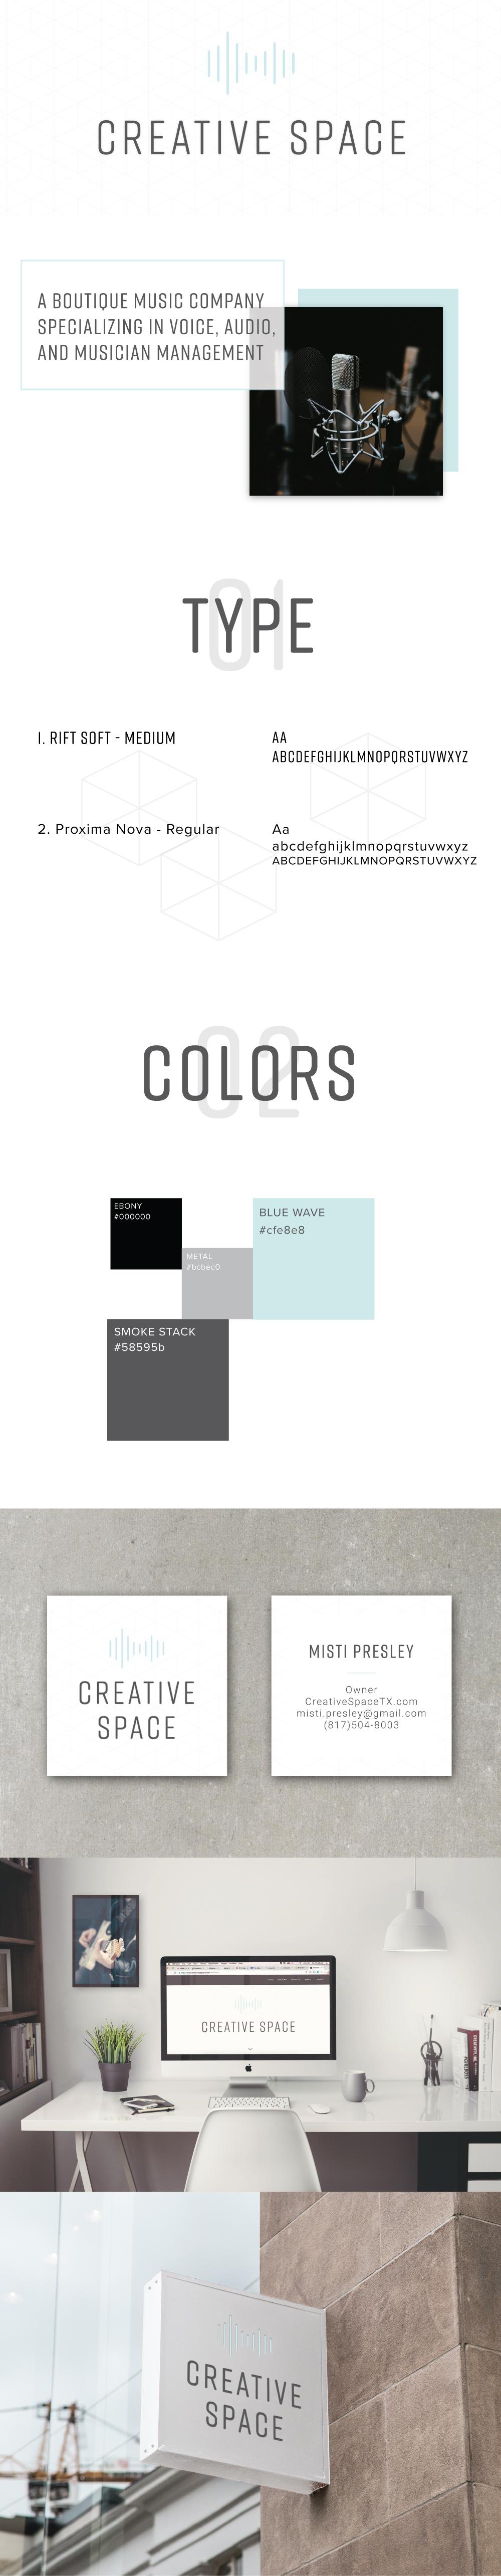 Creative-Space-Presentation.jpg